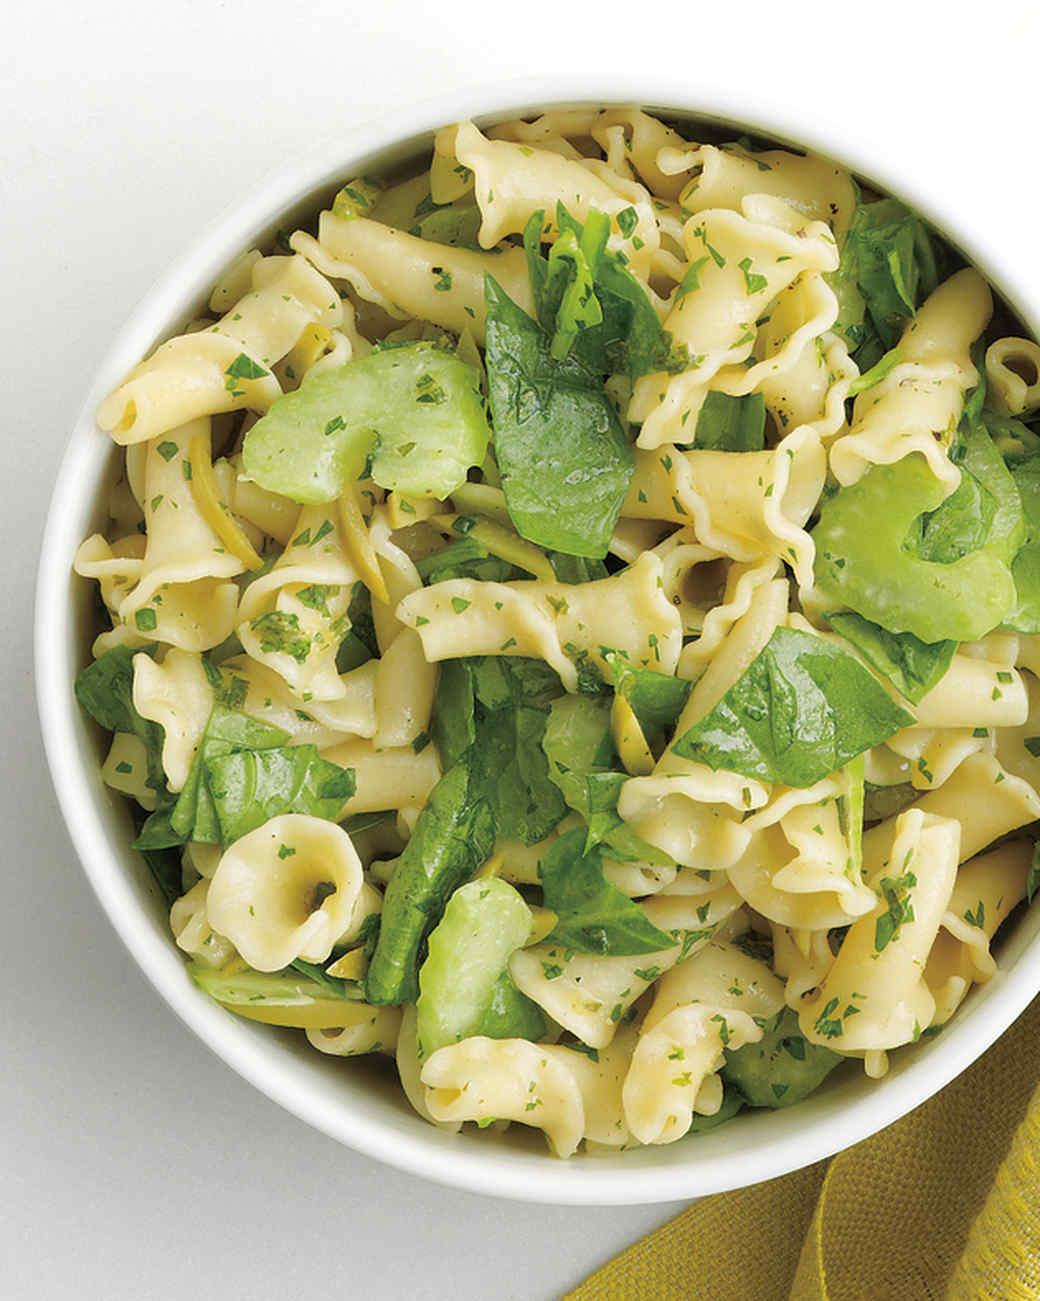 Basil spinach pasta recipe